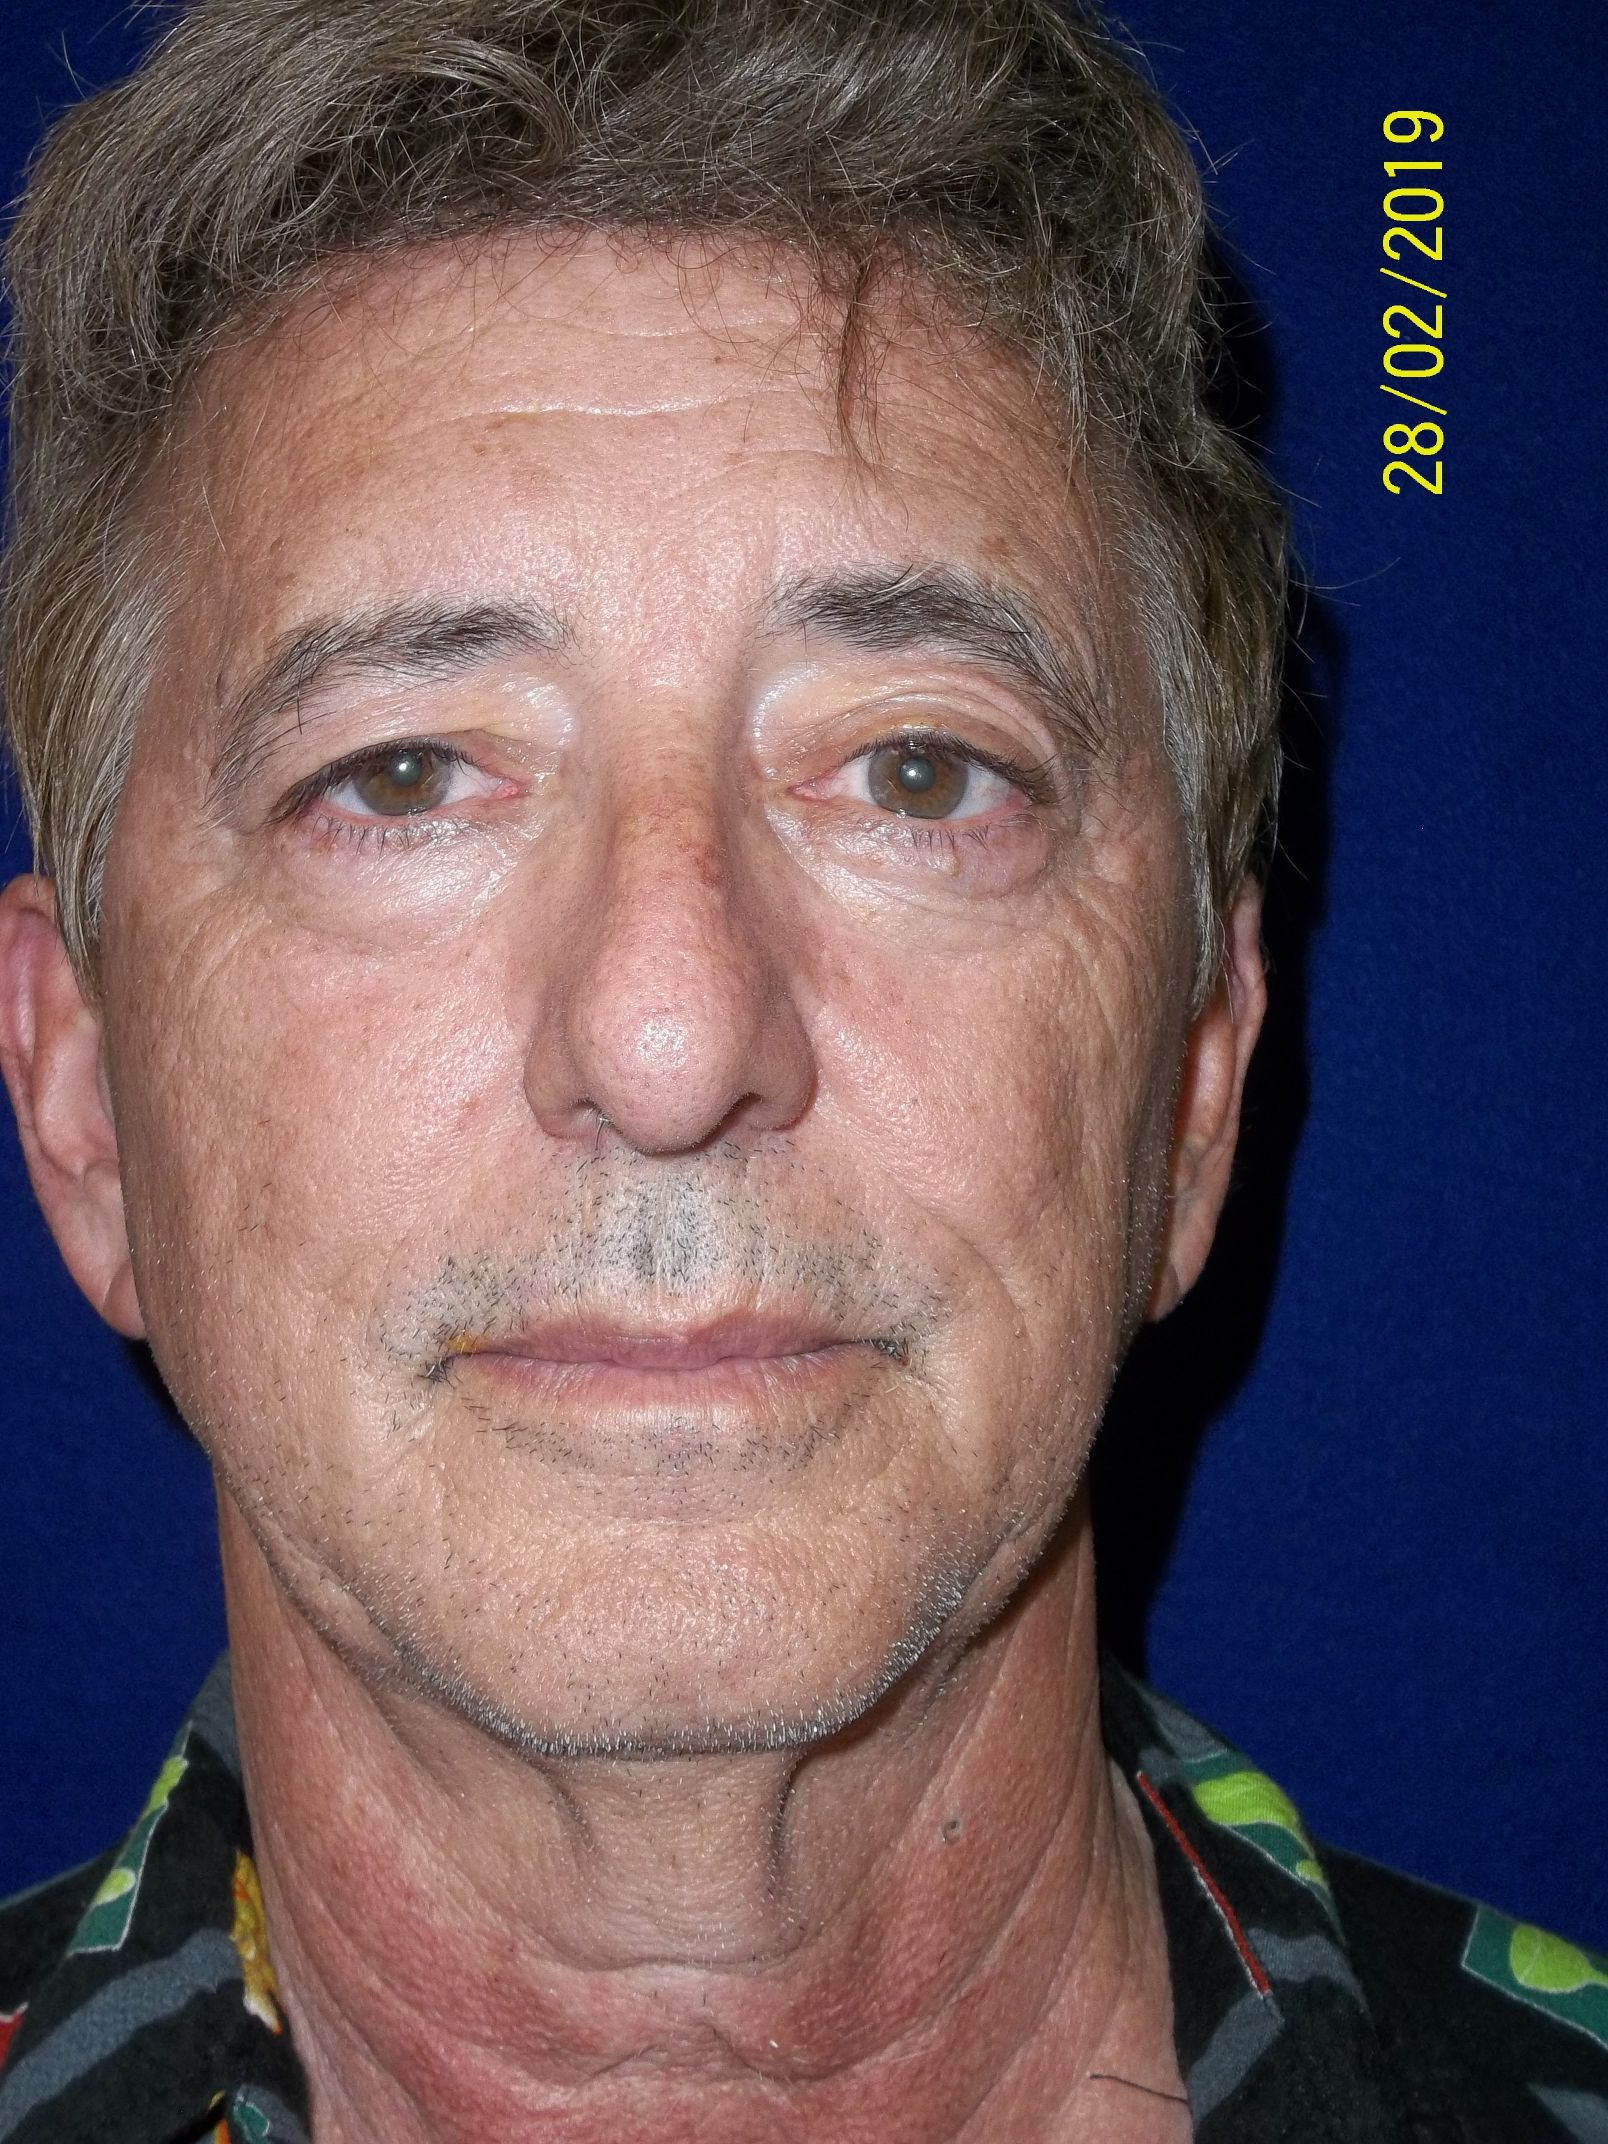 Eye Lid Surgery Tampa FL | Blepharoplasty Surgery Tampa FL ...